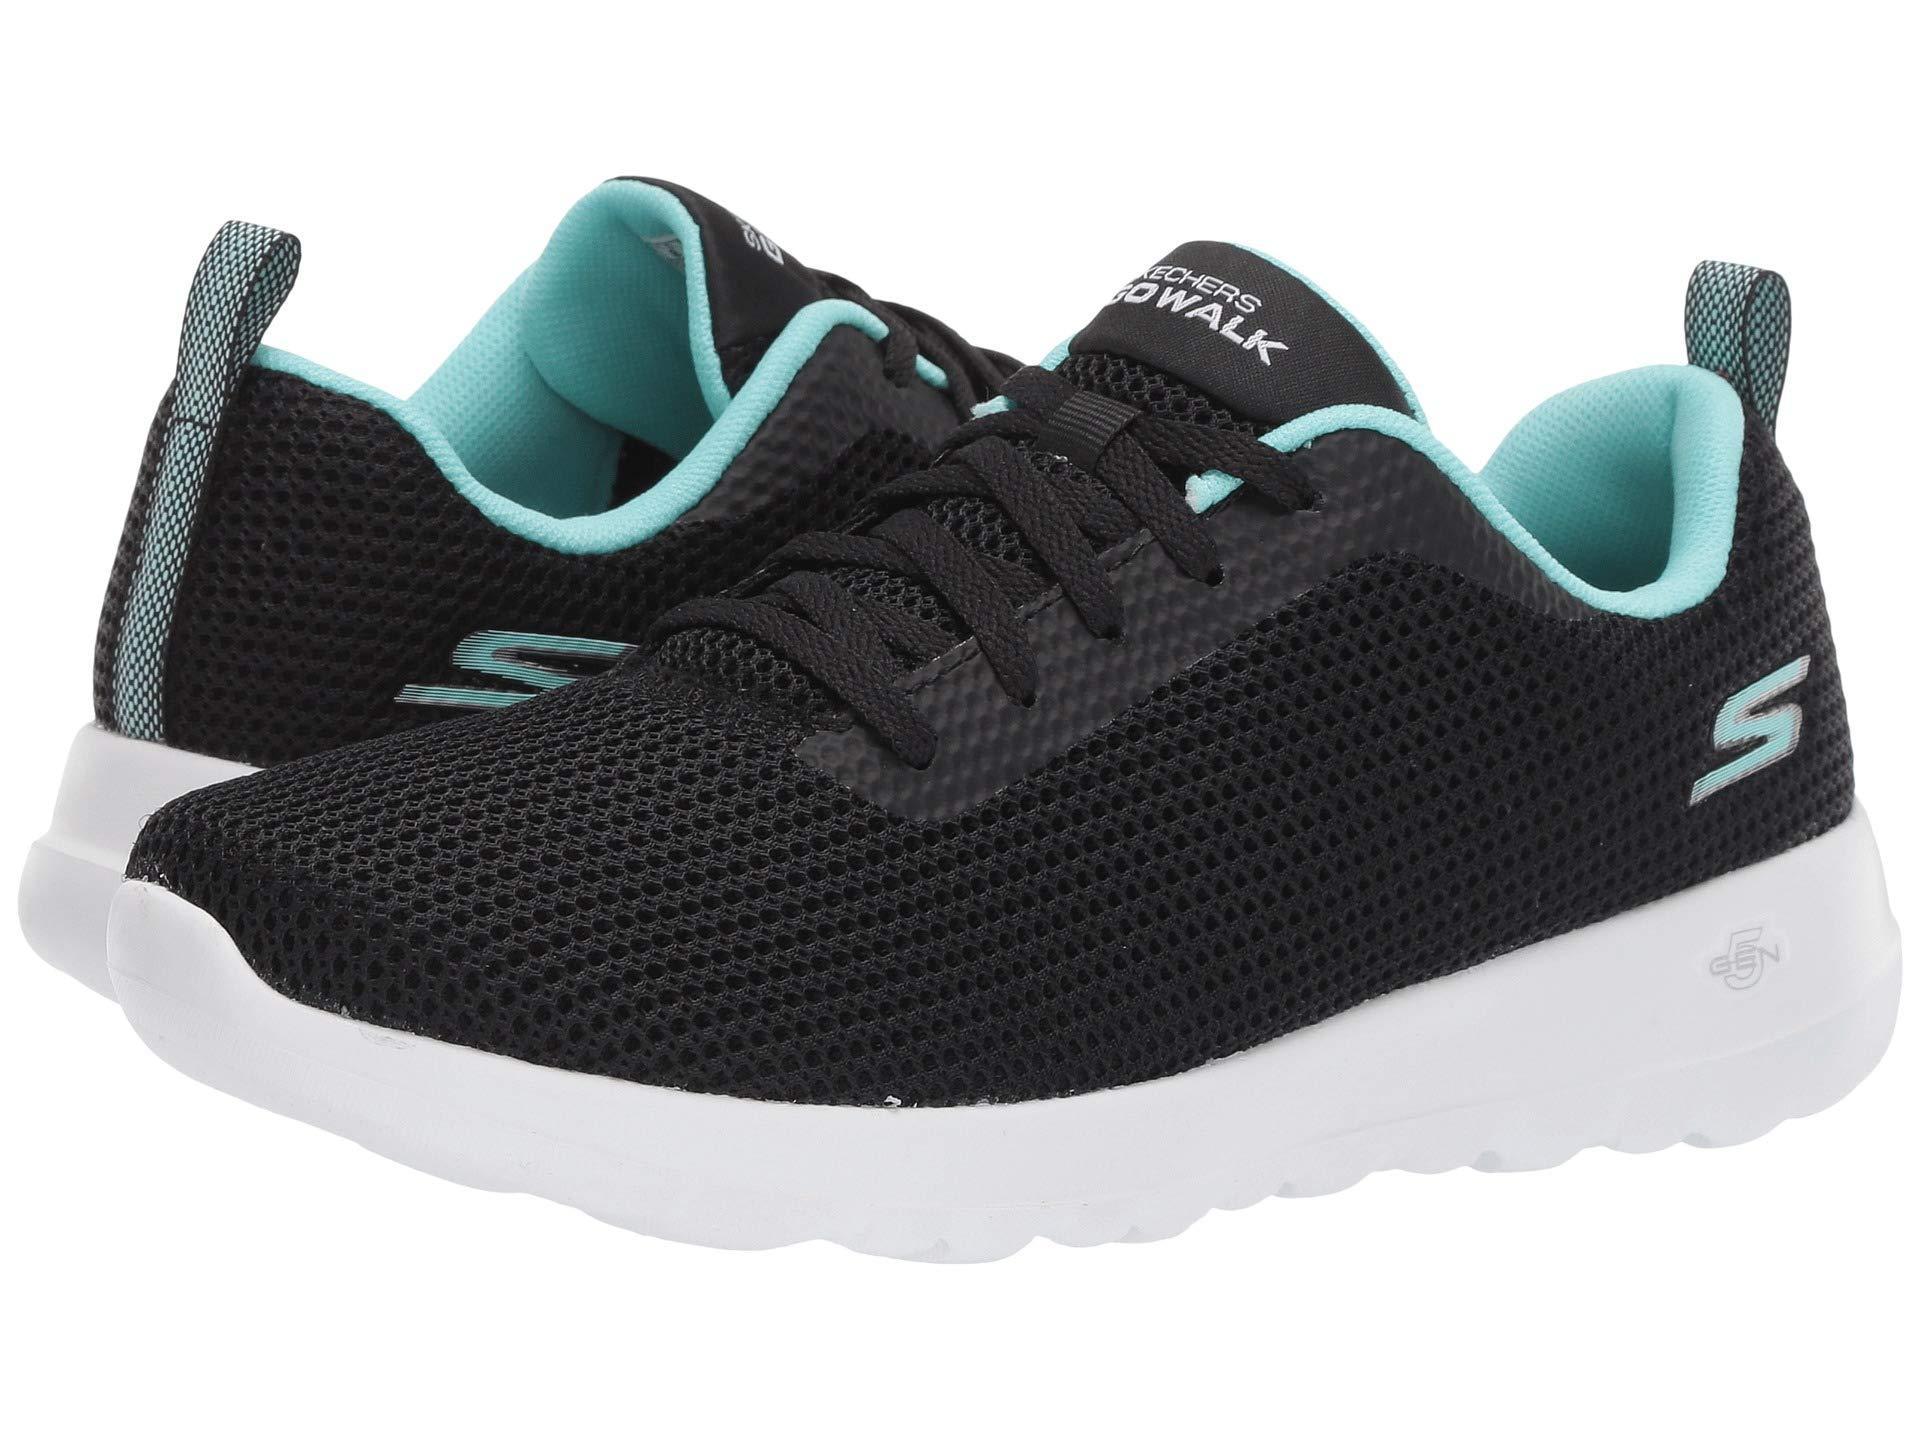 new product a99d6 10bf5 Lyst - Skechers Go Walk Joy - 15641 (navy pink) Women s Shoes in Black